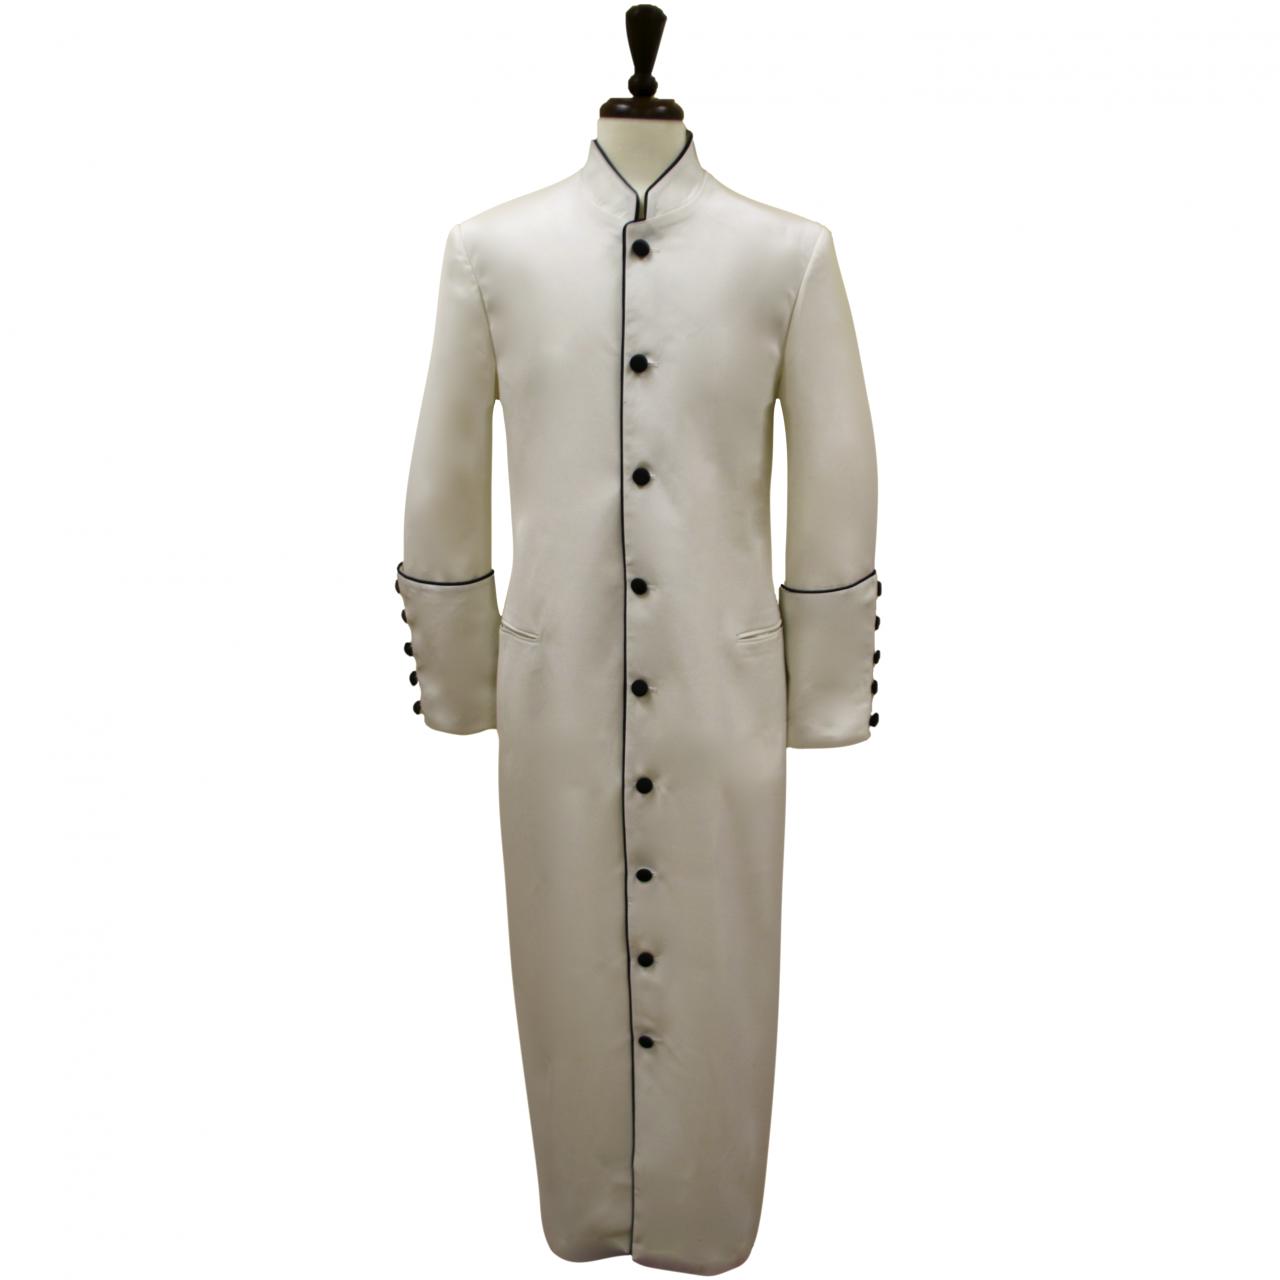 157 M. Men's Classic Pastor/Clergy Robe - Ivory/Black